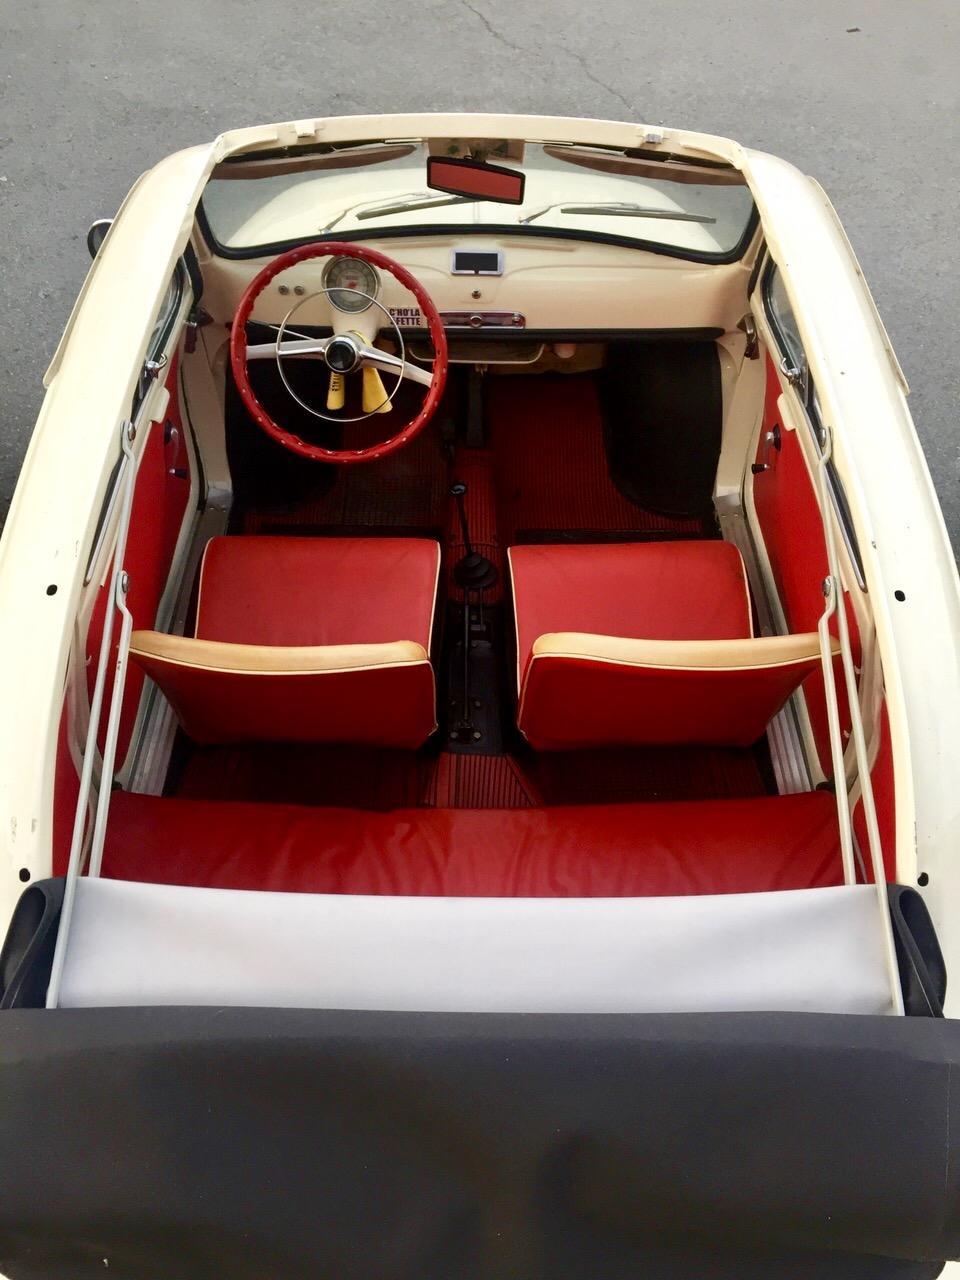 1962 Fiat 500D Saloon & Levante Graziella 300 Caravan  Chassis no. to be advised